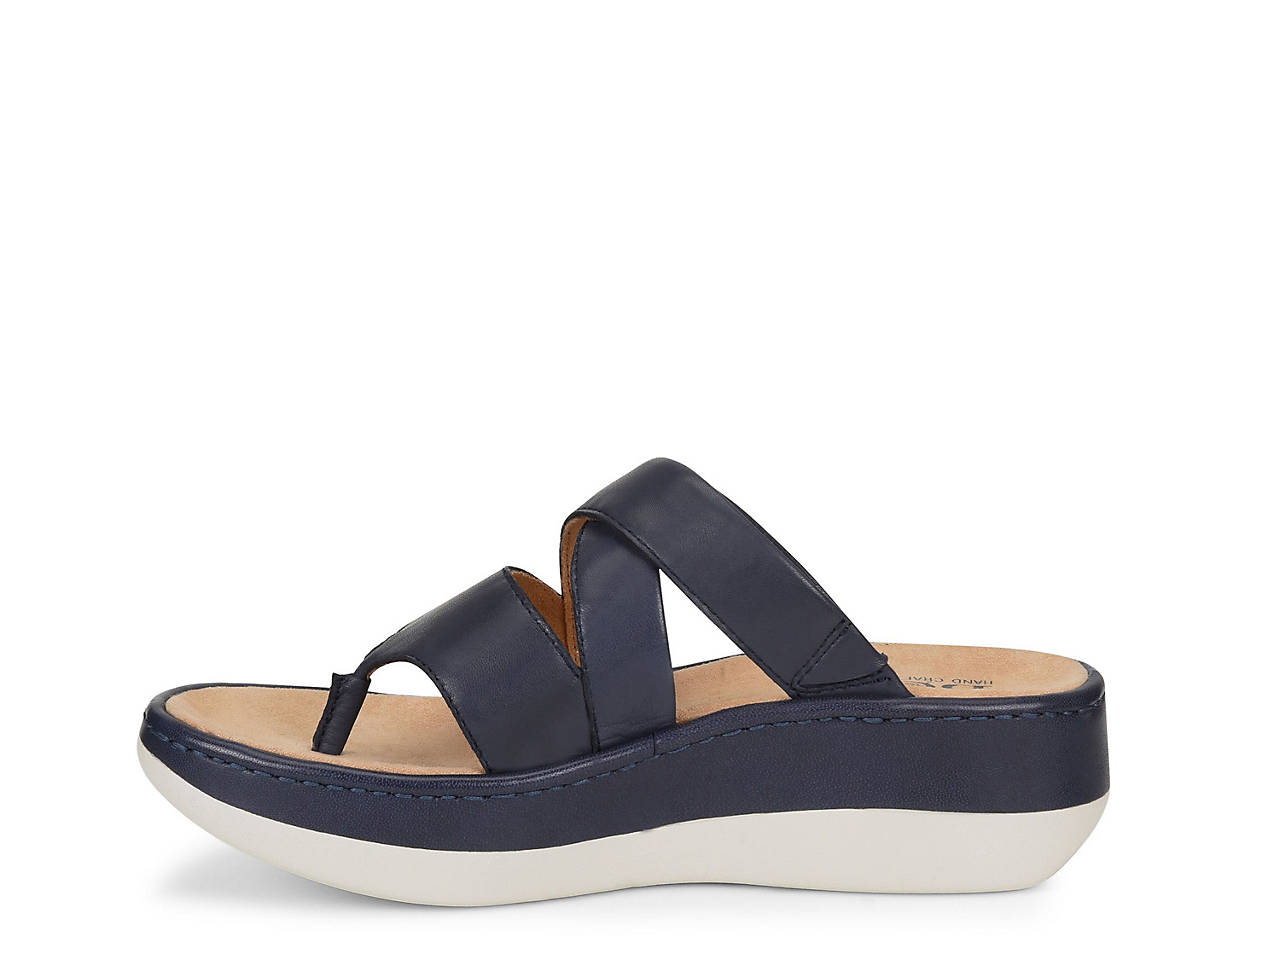 27874945dd32 Born Uinta Wedge Sandal Women s Shoes